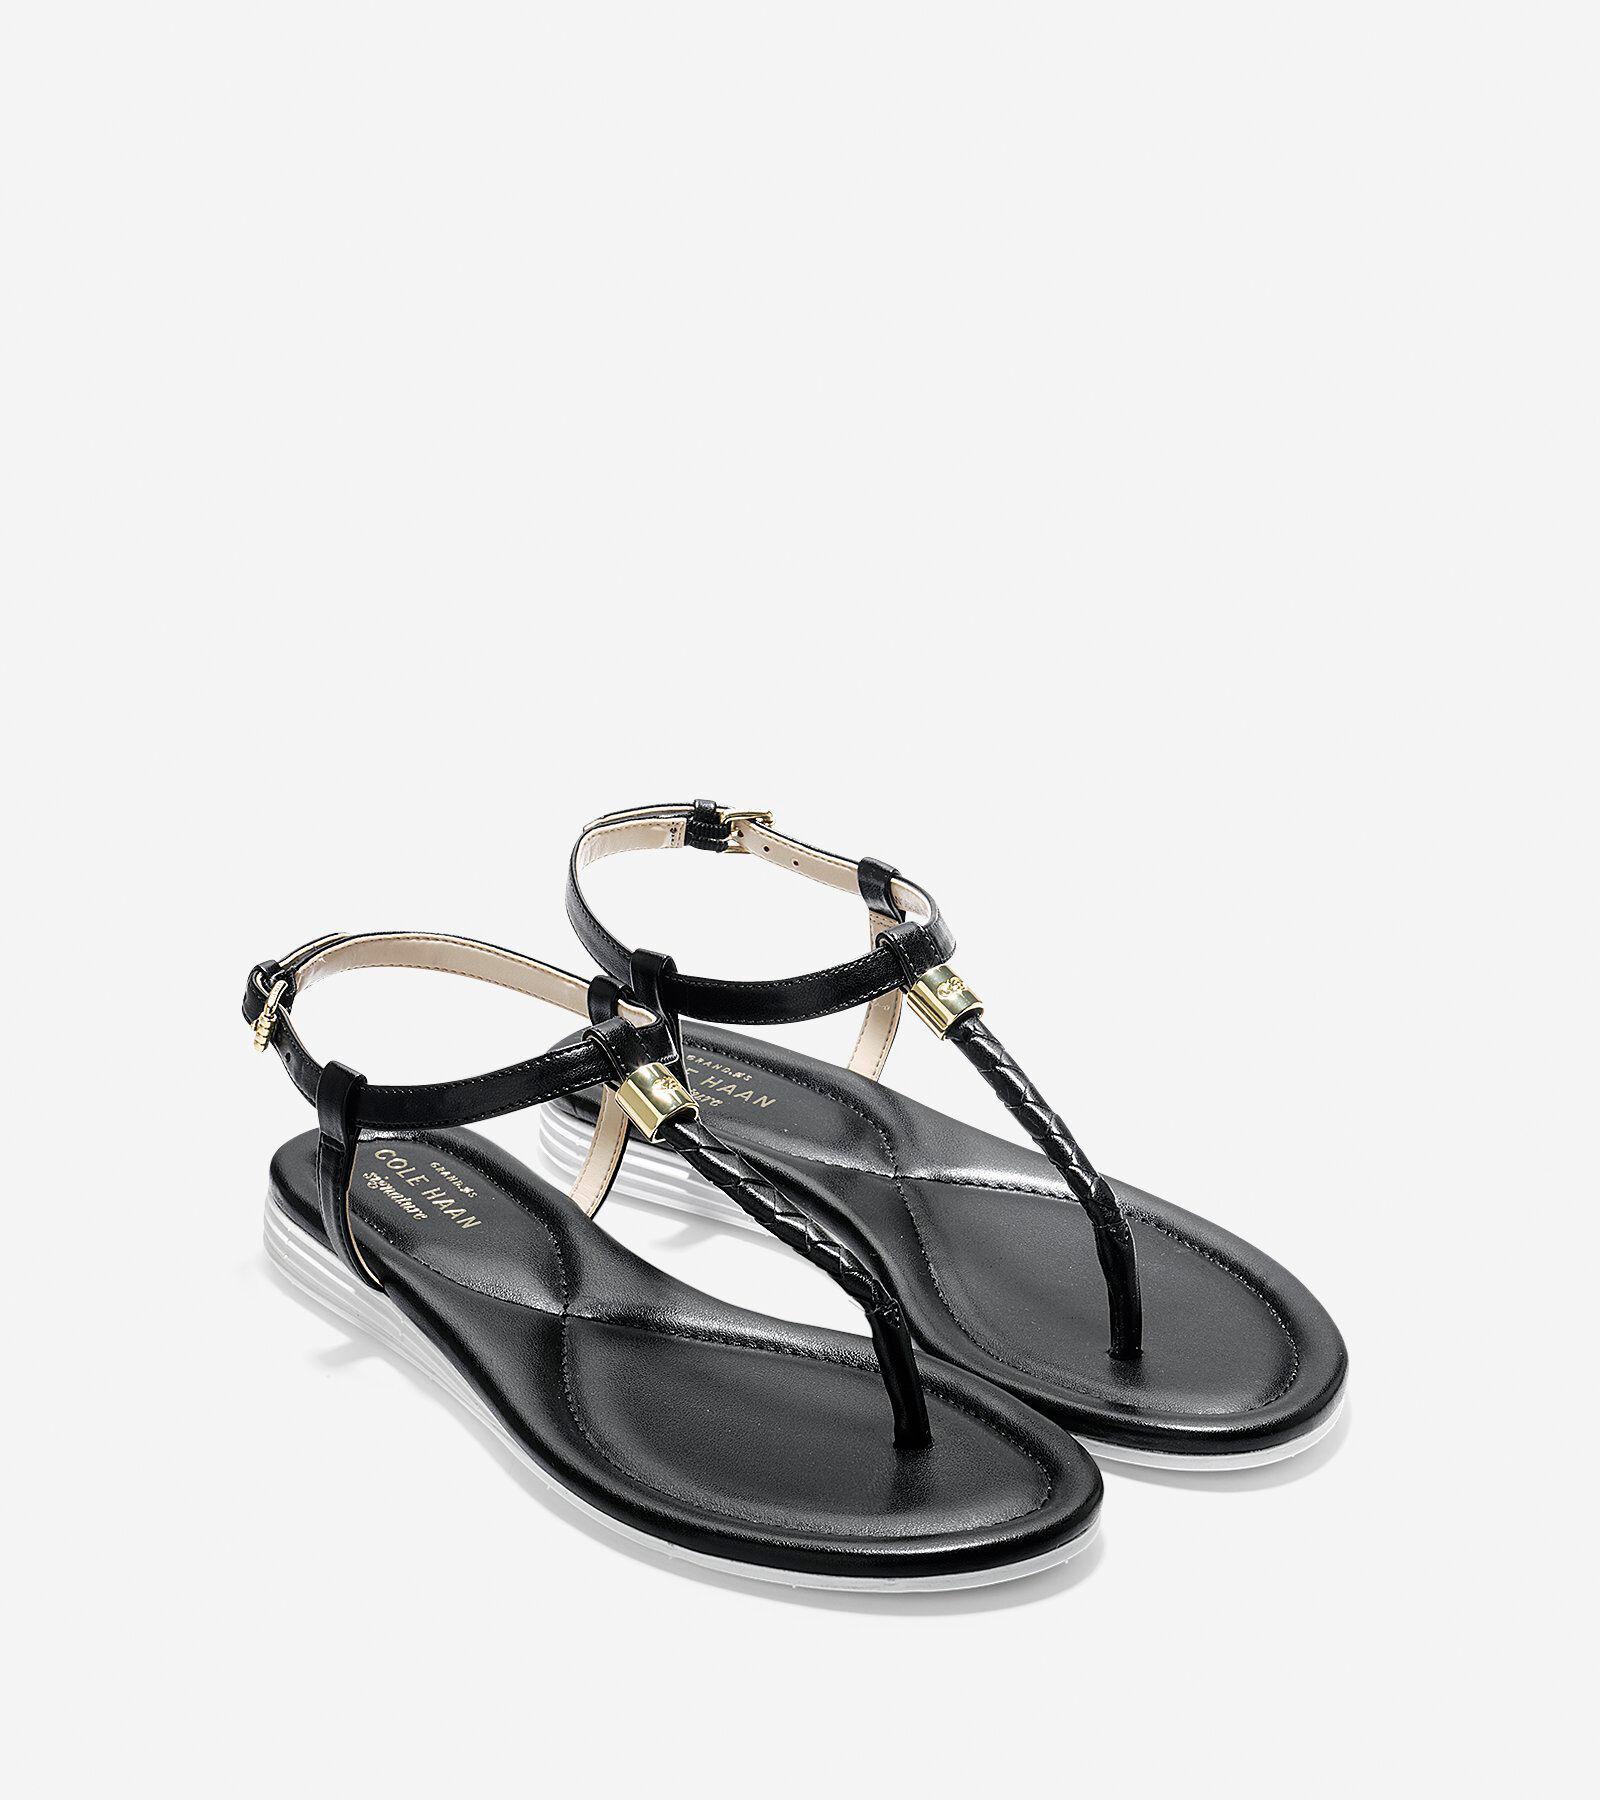 Cole Haan Braied Thong Sandals best wholesale cheap online HJ7cN